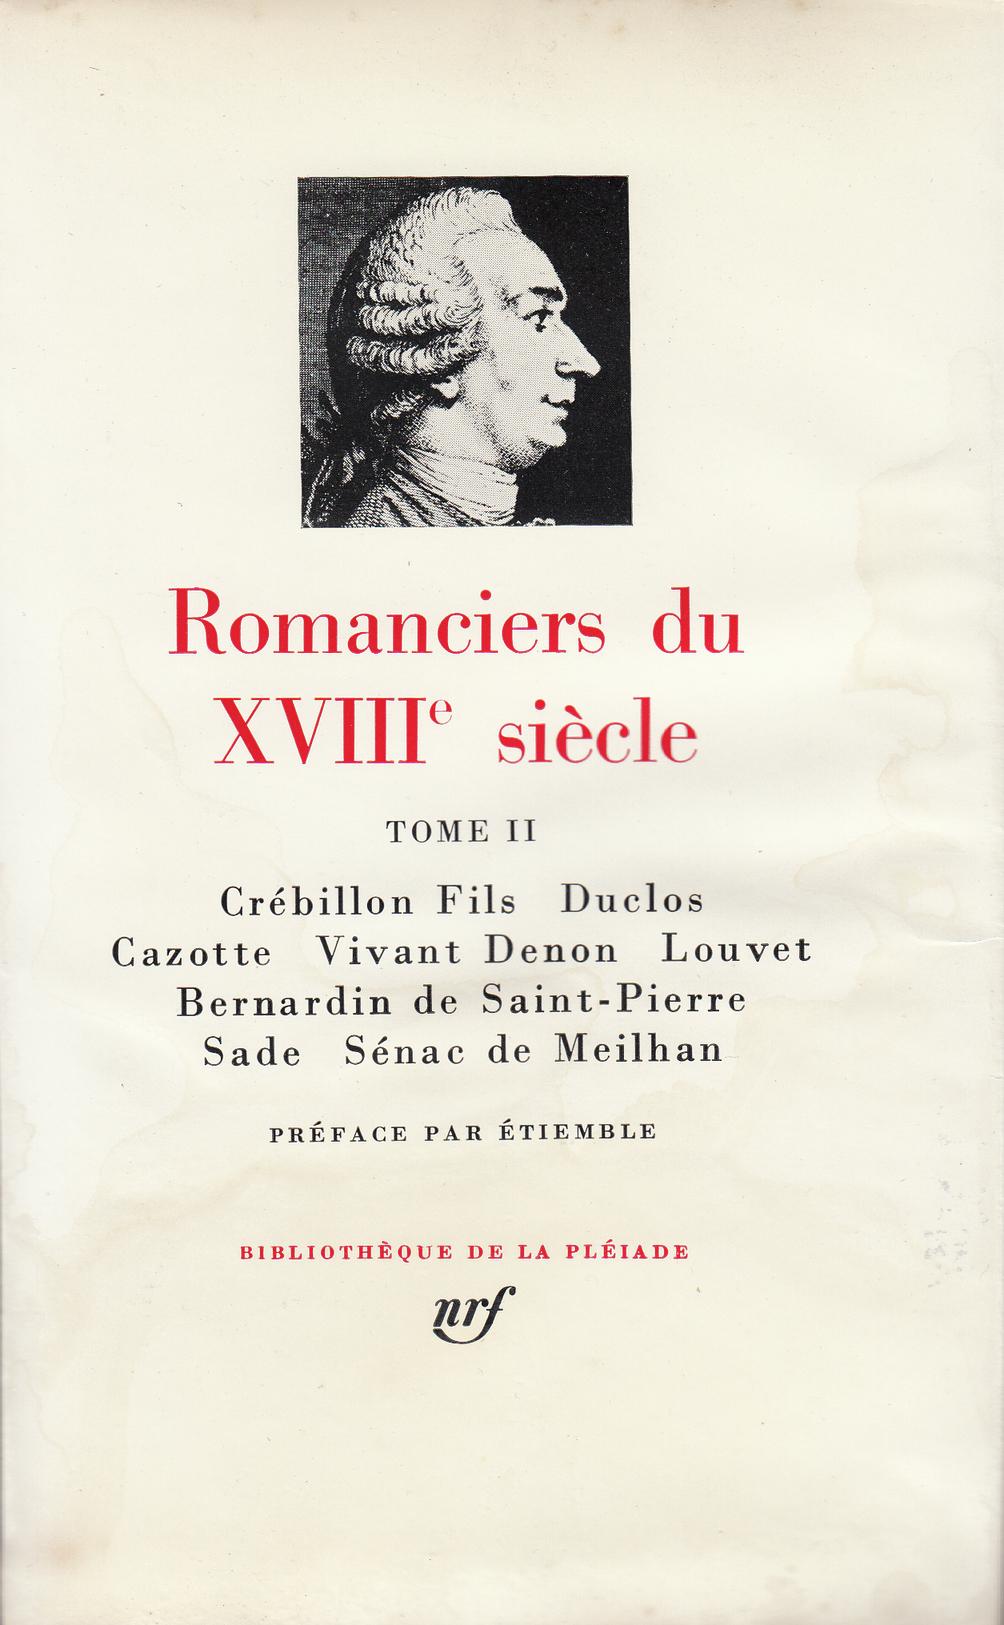 ROMANCIERS DU XVIIIE SIECLE T2